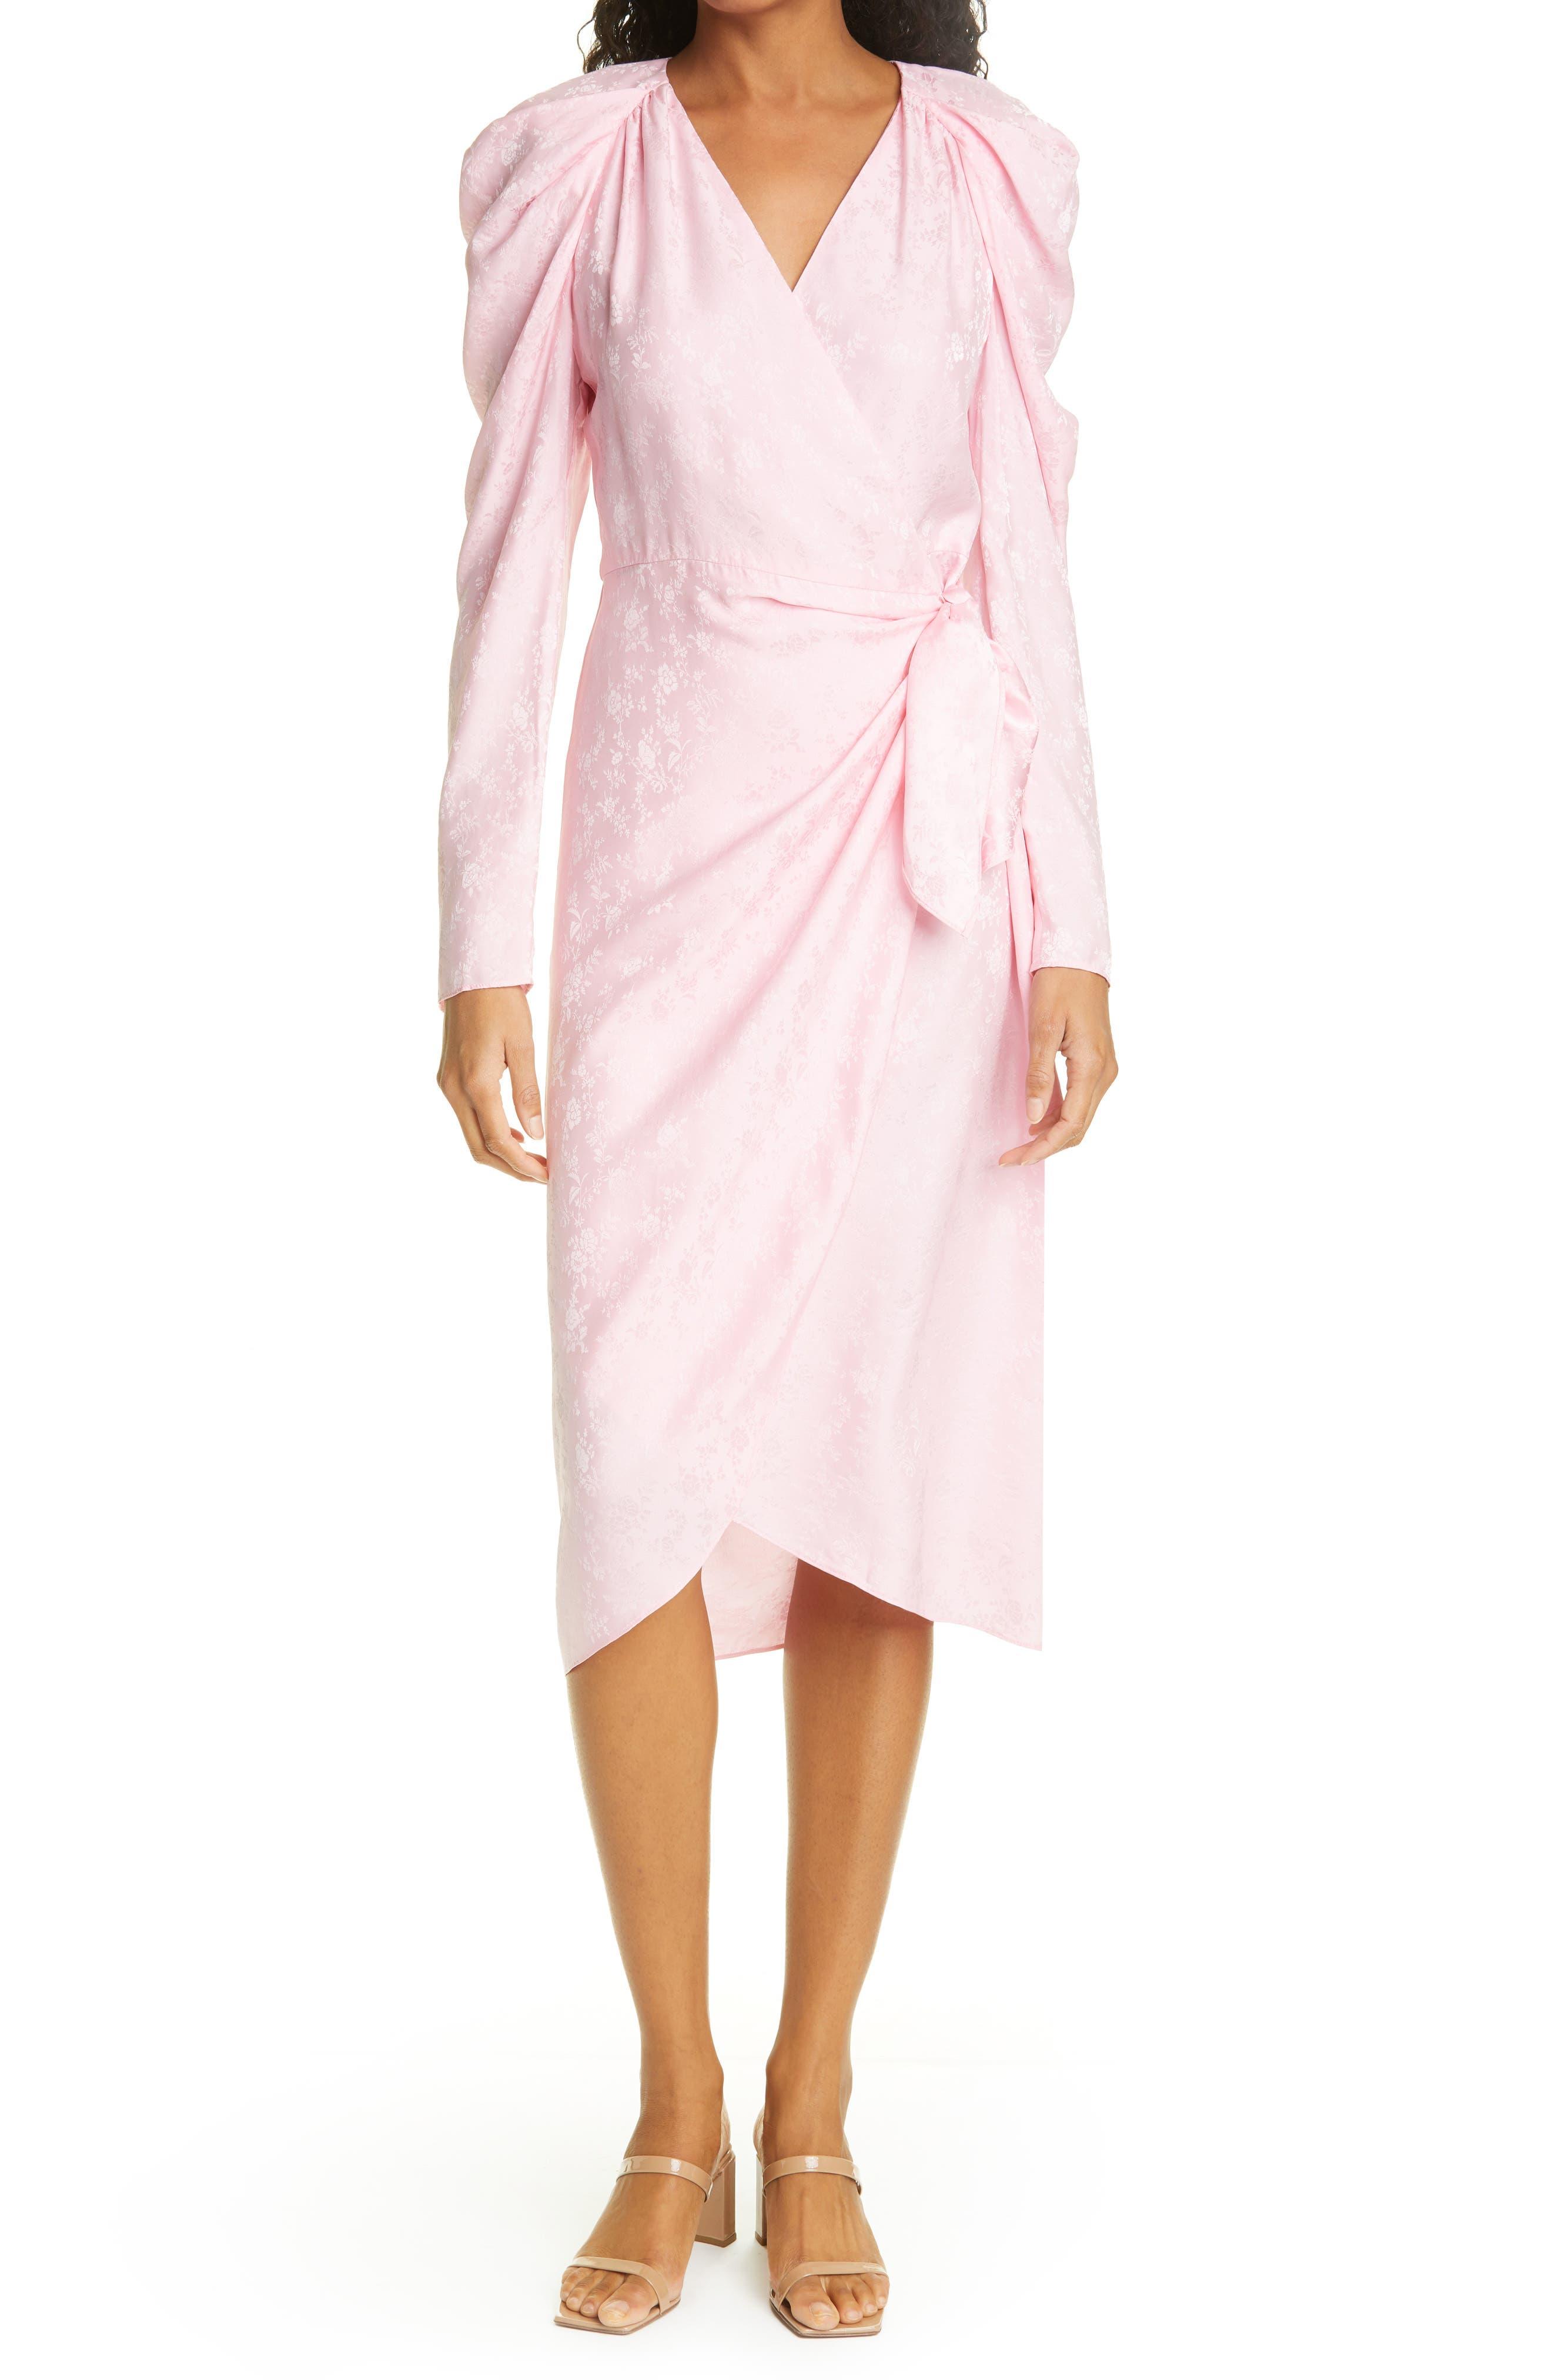 Floral Satin Jacquard Long Sleeve Wrap Dress